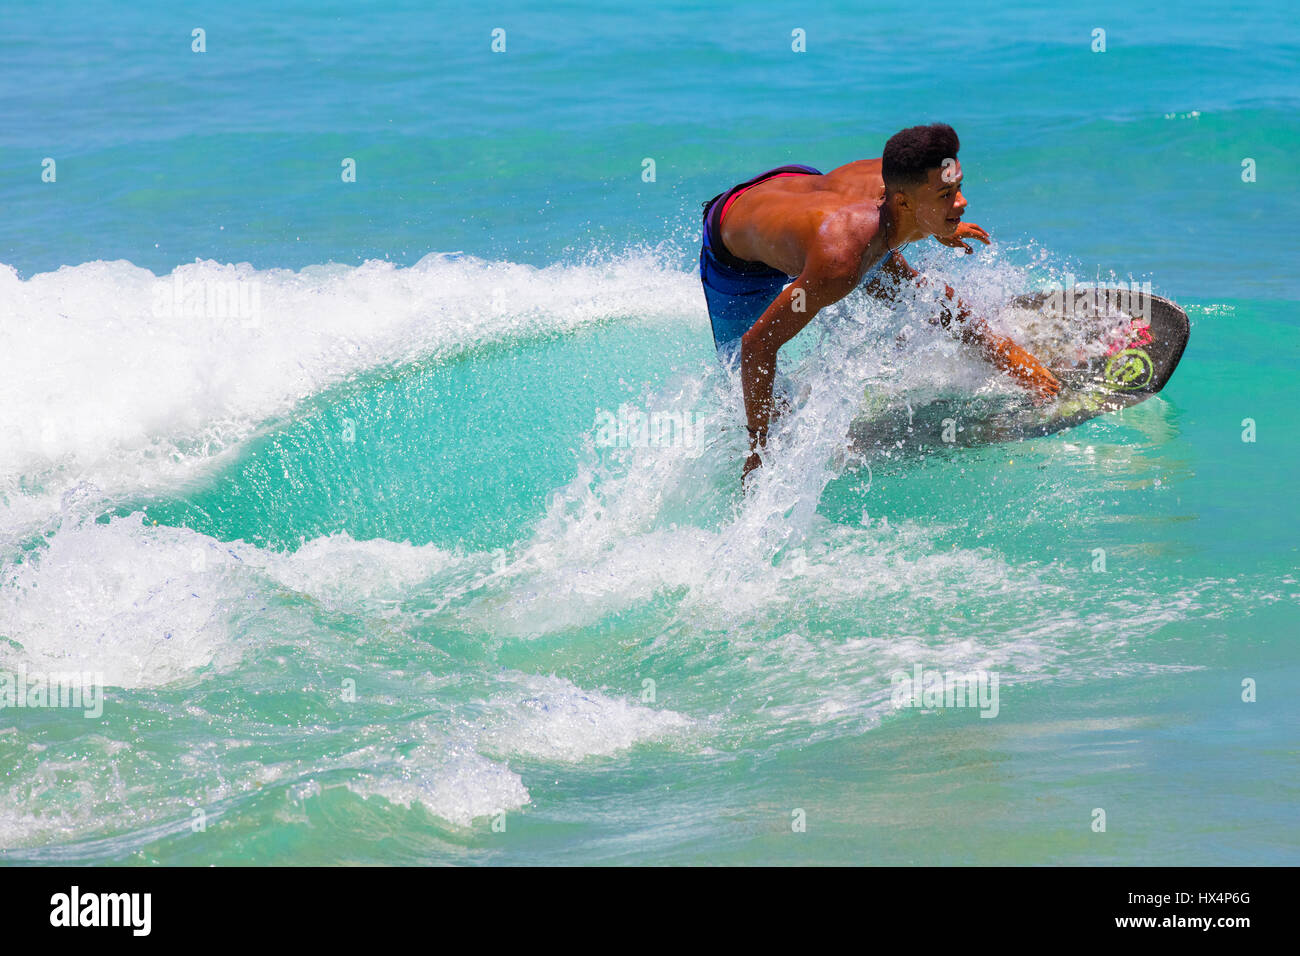 Joven surfista, cerca de la playa de Lopes Mendes. Ilha Grande, RJ, Brasil. Foto de stock